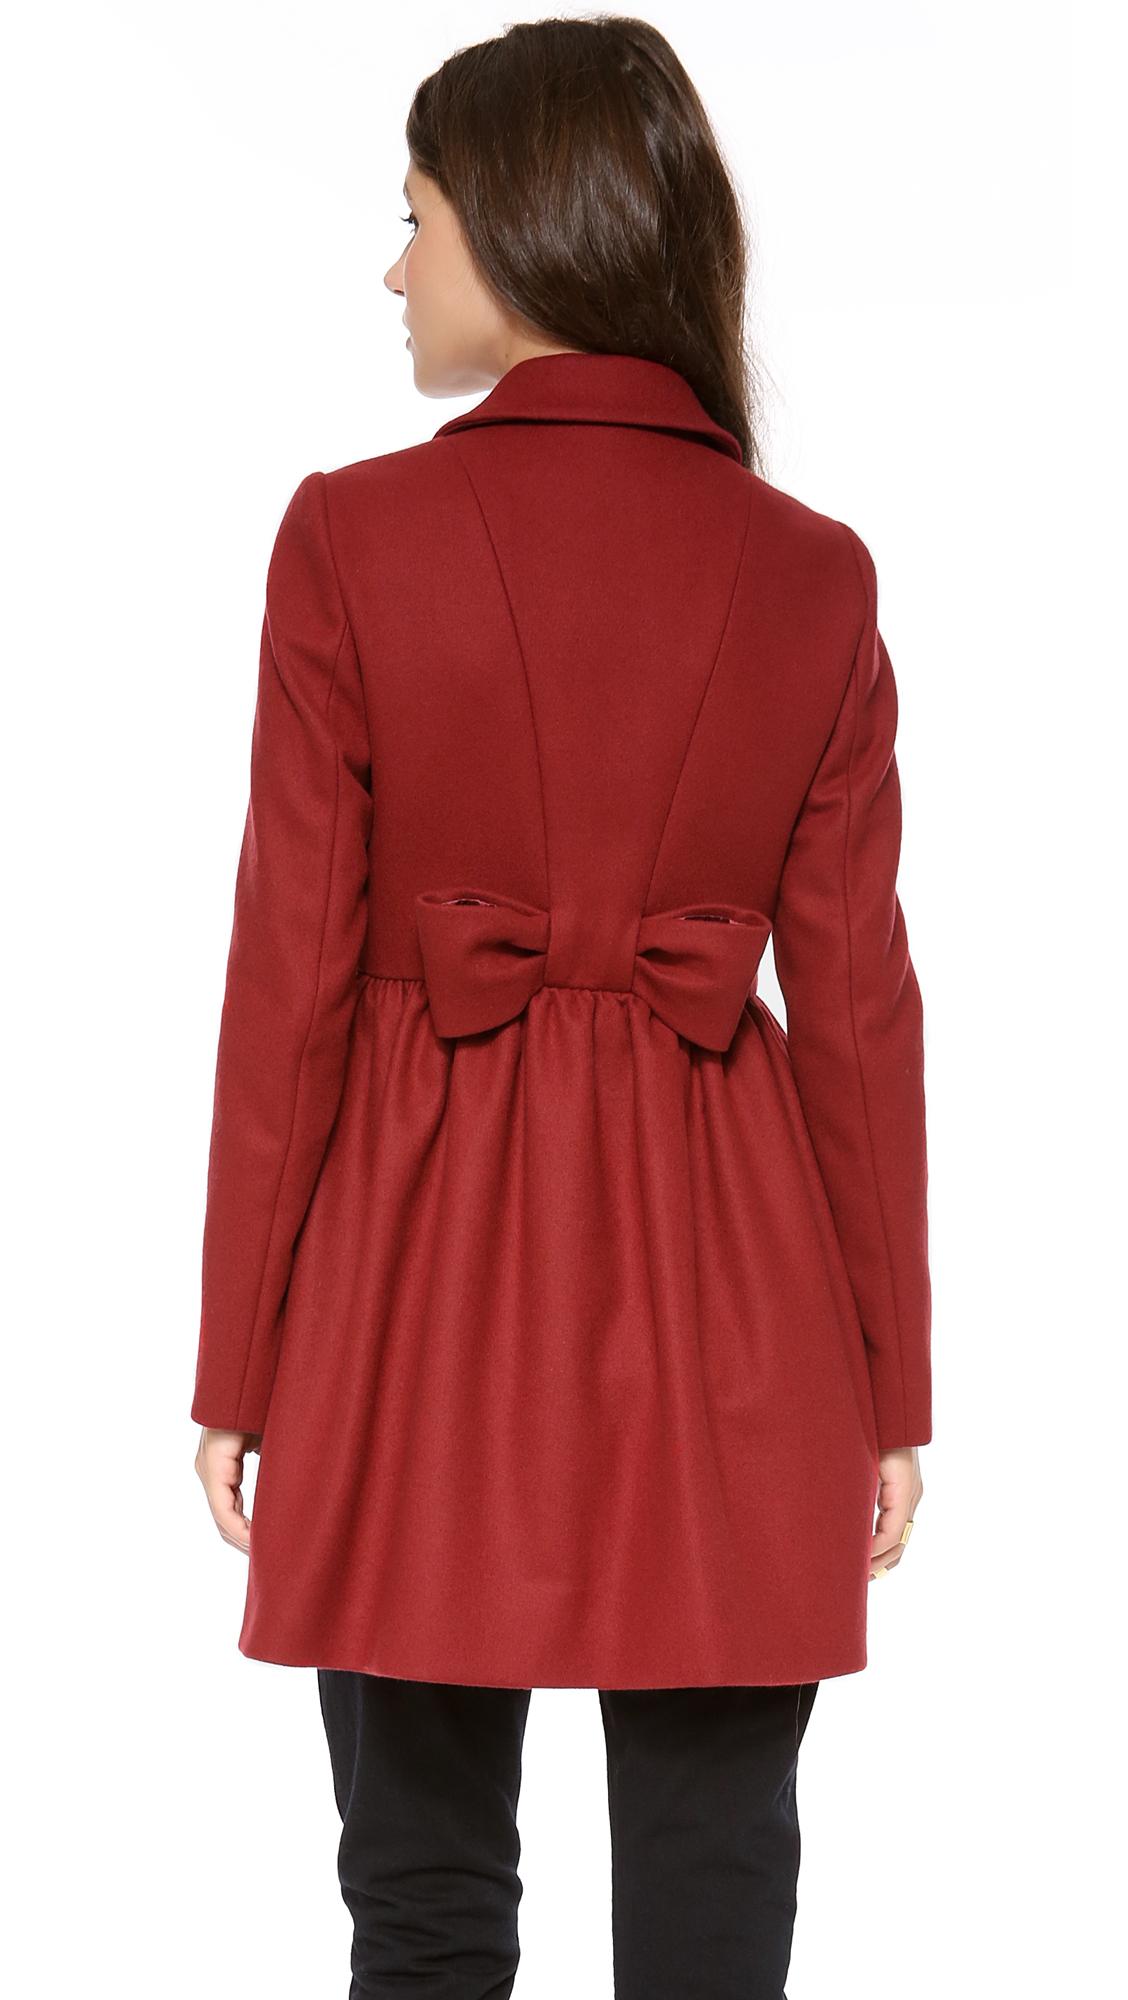 51471ec920b4 RED Valentino Bow Back Coat   SHOPBOP